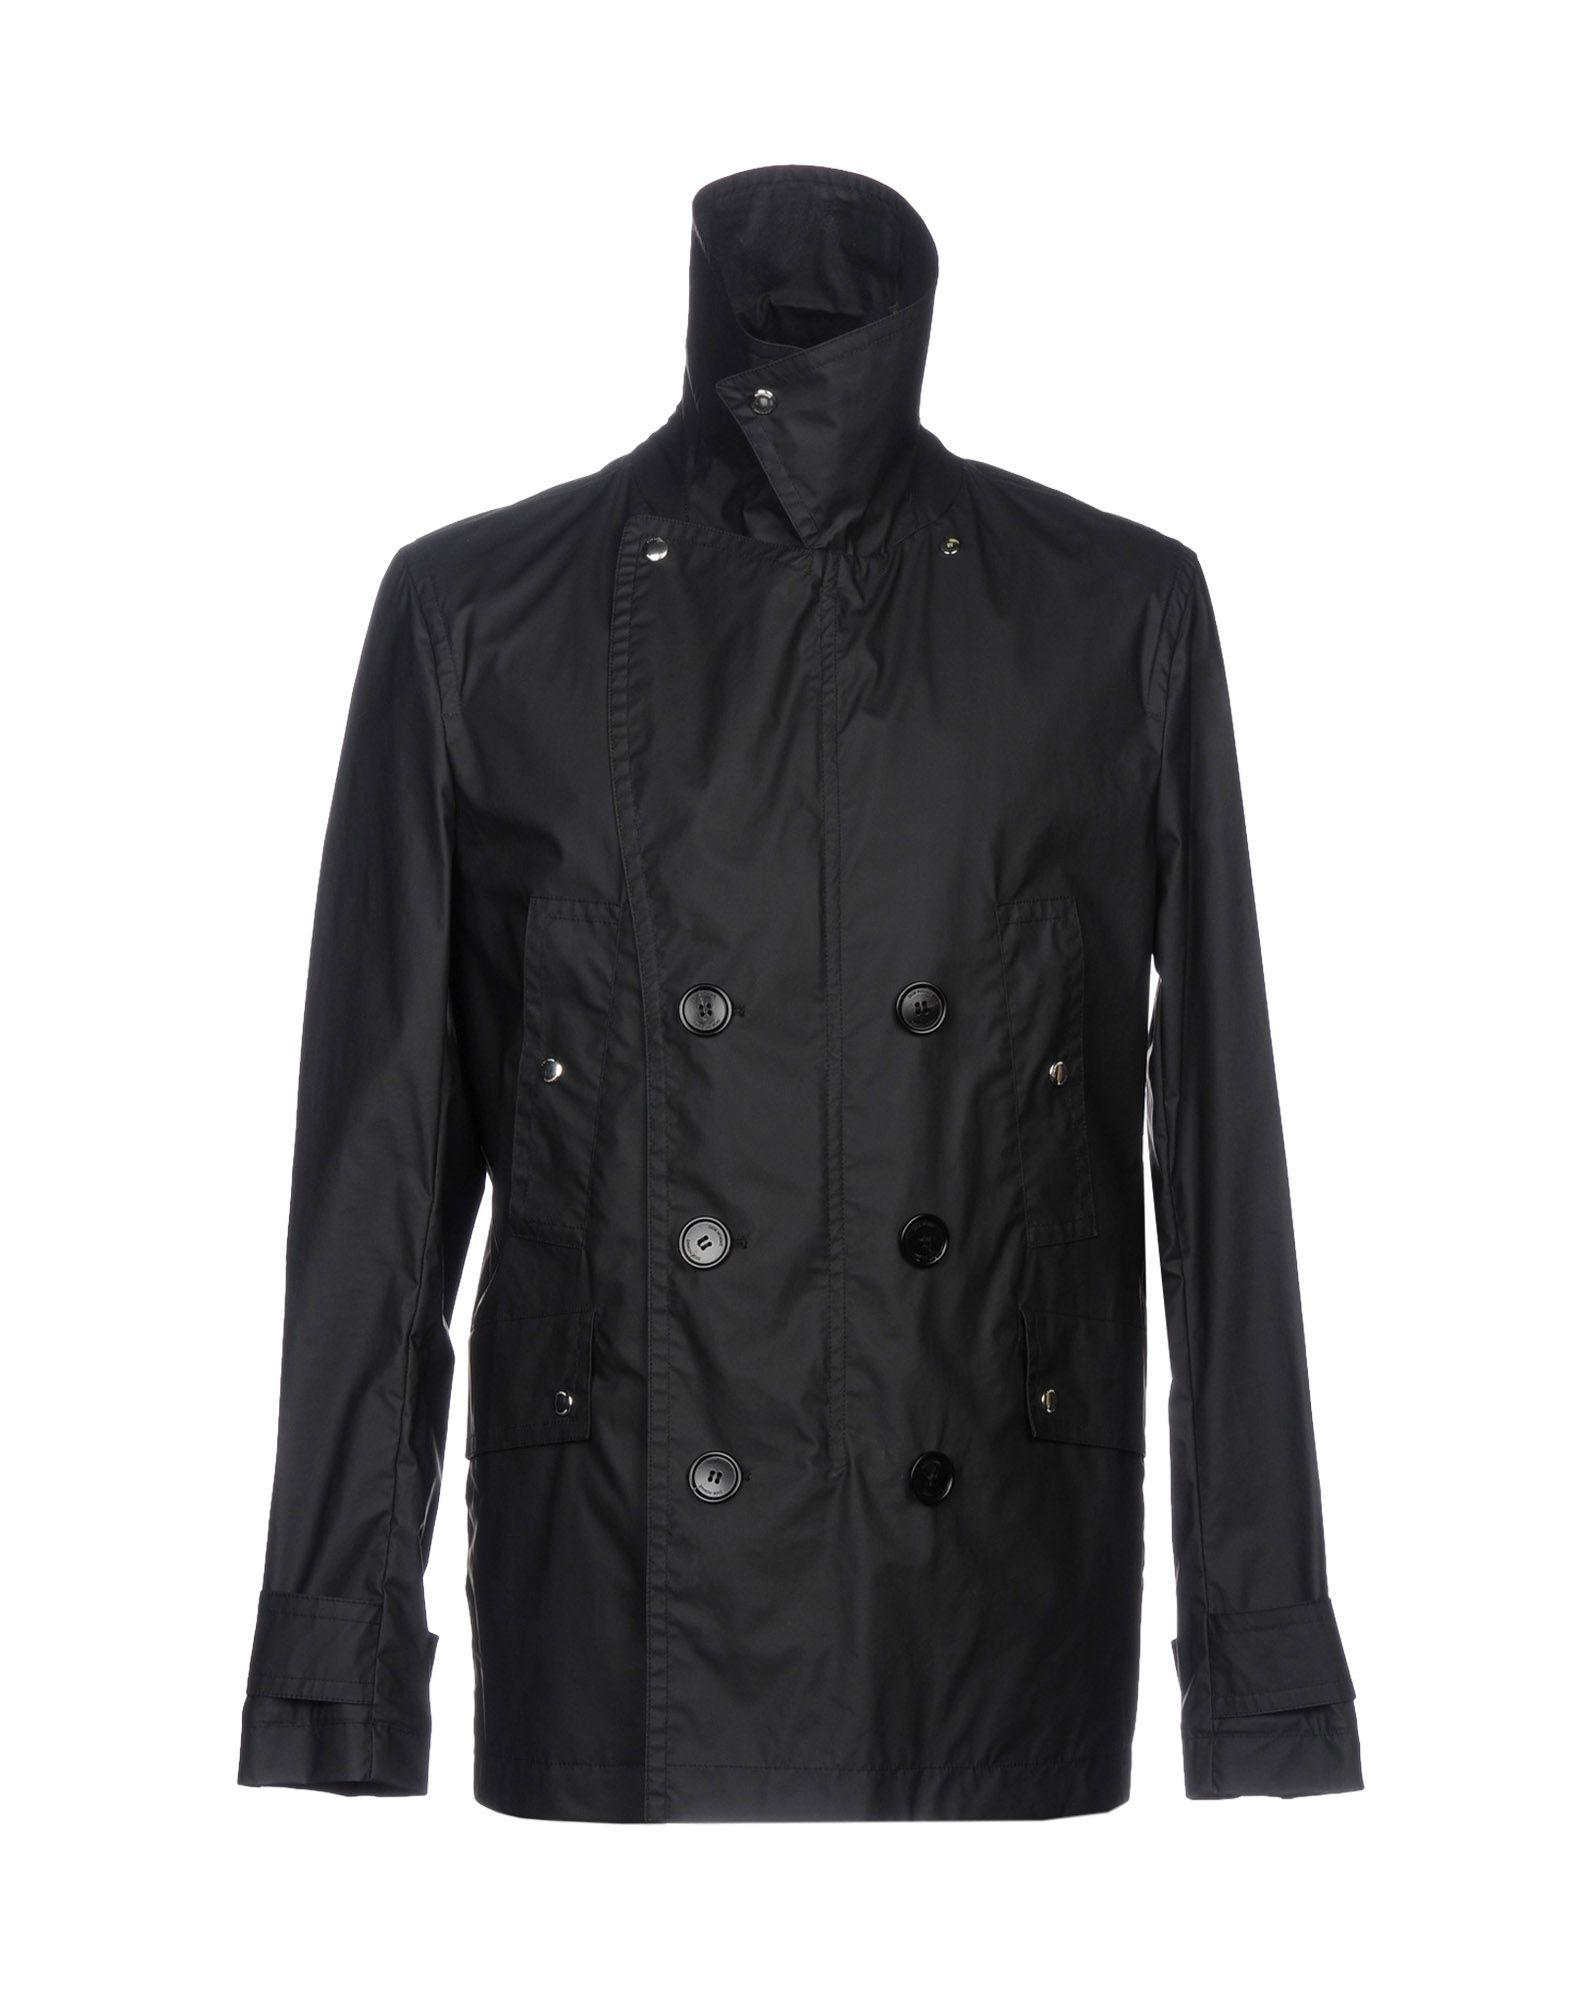 Dior Homme Jackets In Black